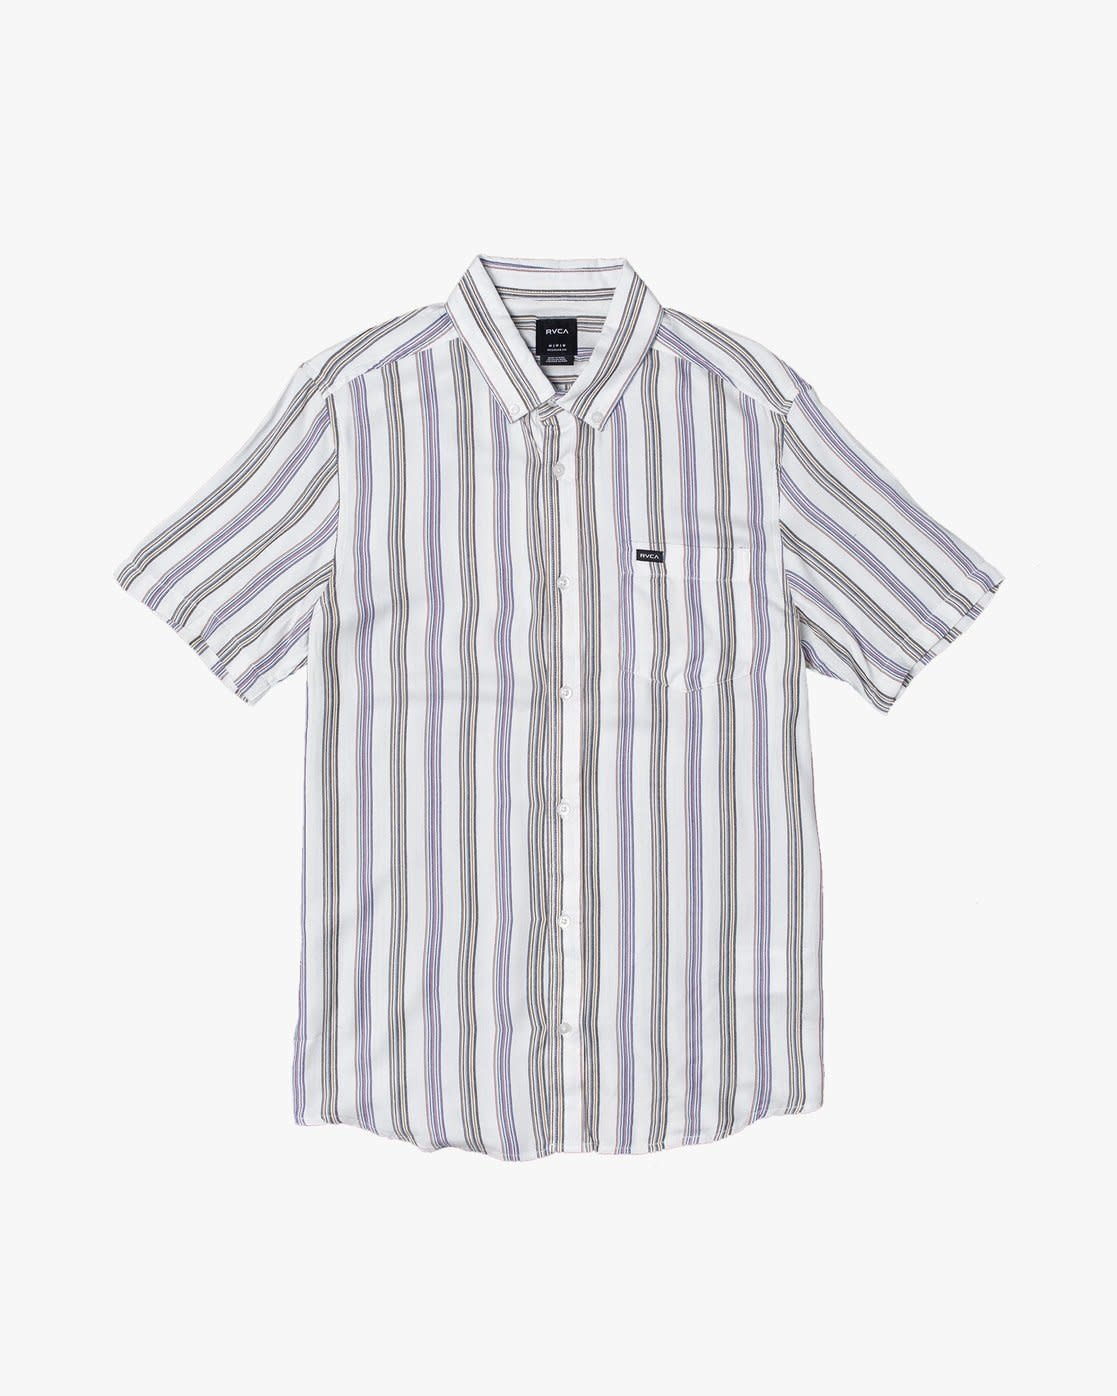 RVCA Merced SS Shirt-1